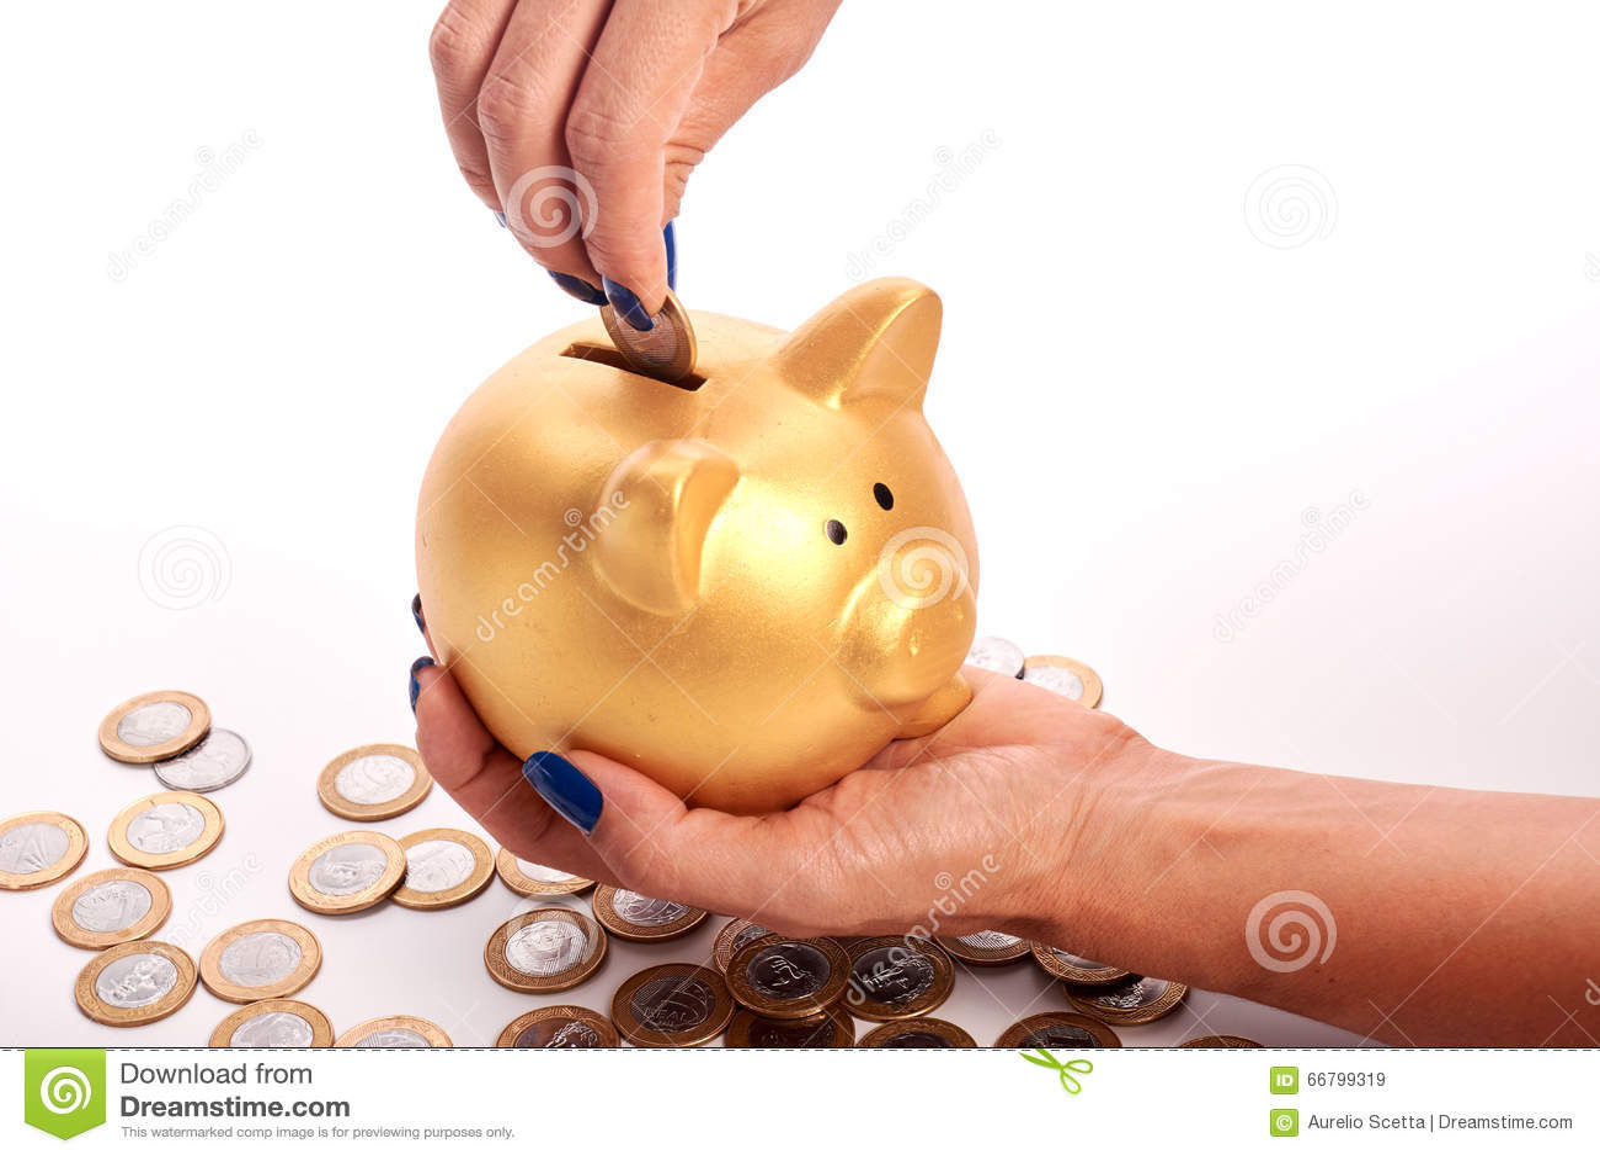 woman u0026 39 s hand putting coins brazilian money into piggy bank